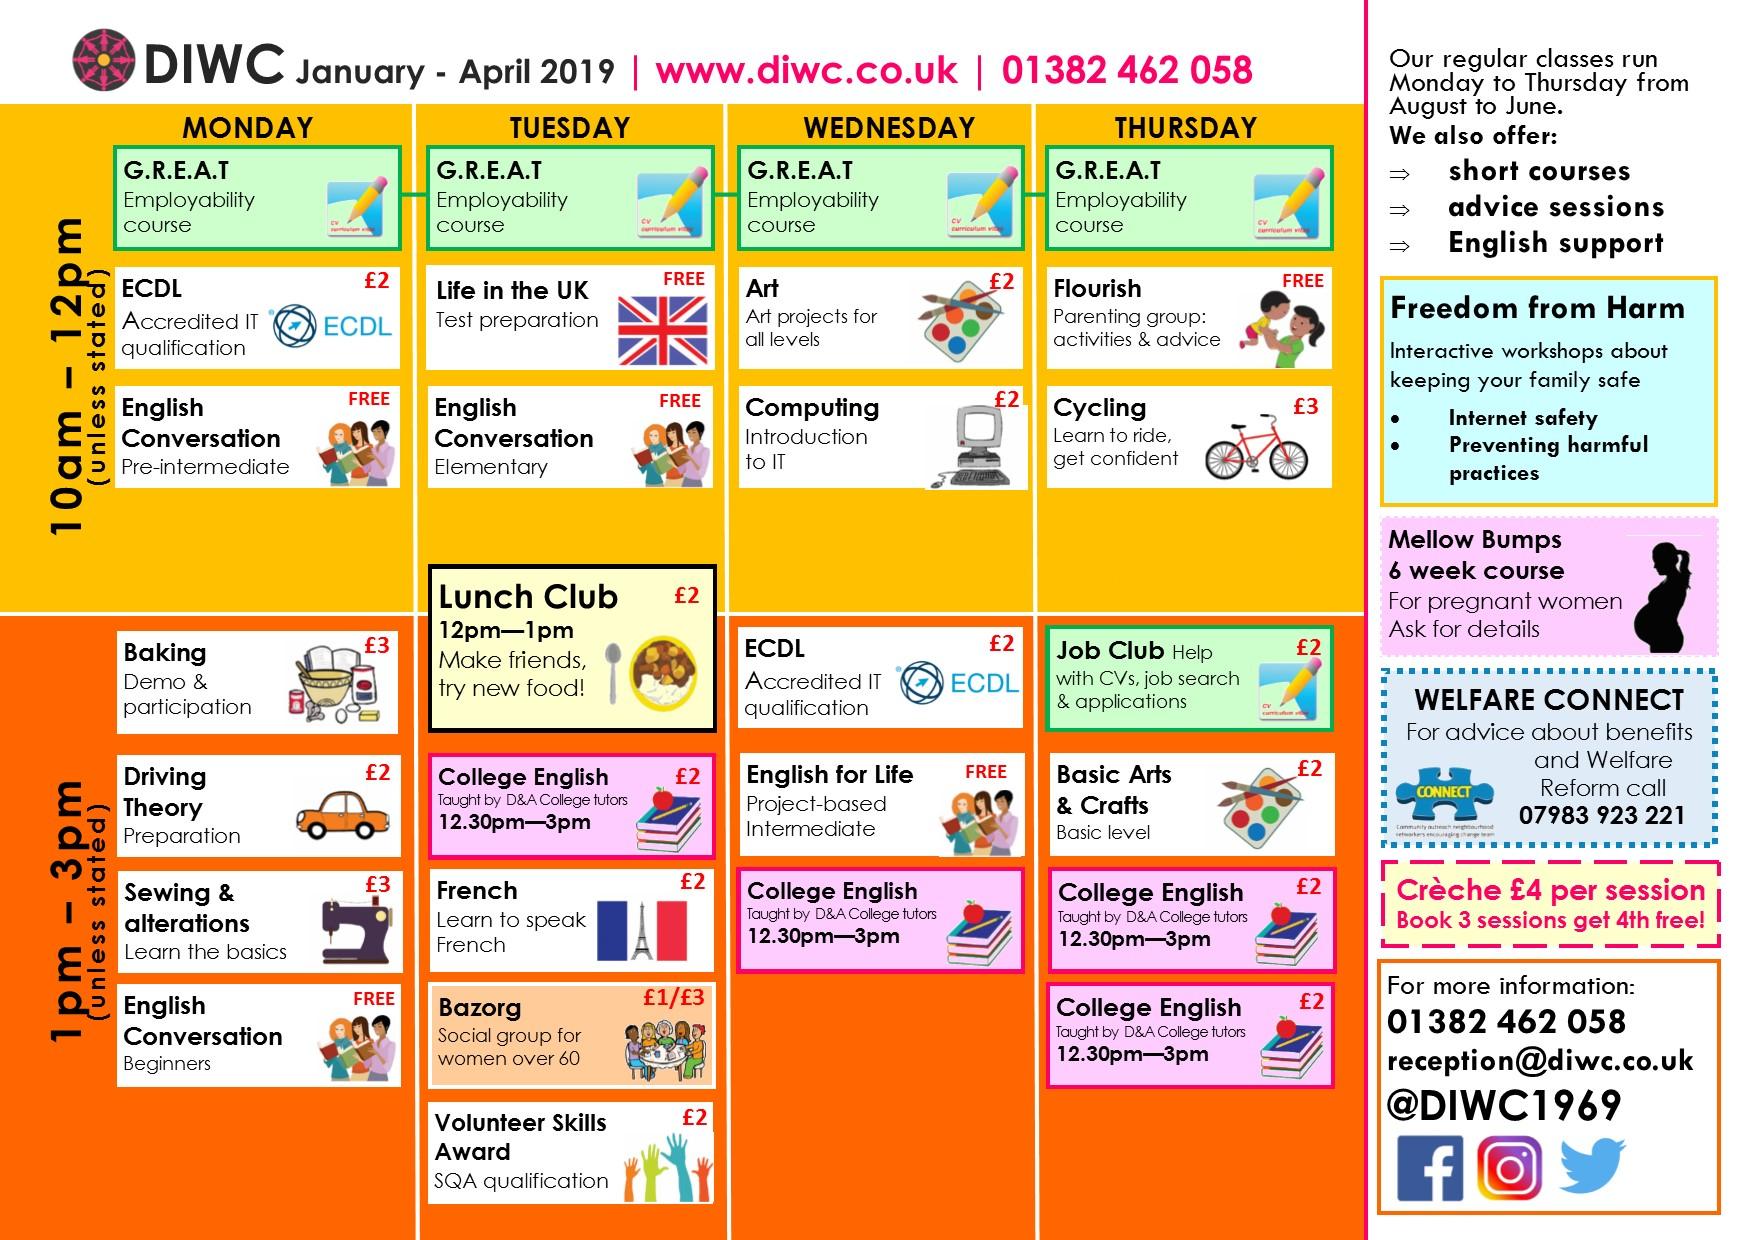 DIWC Timetable - Dundee International Women's Centre